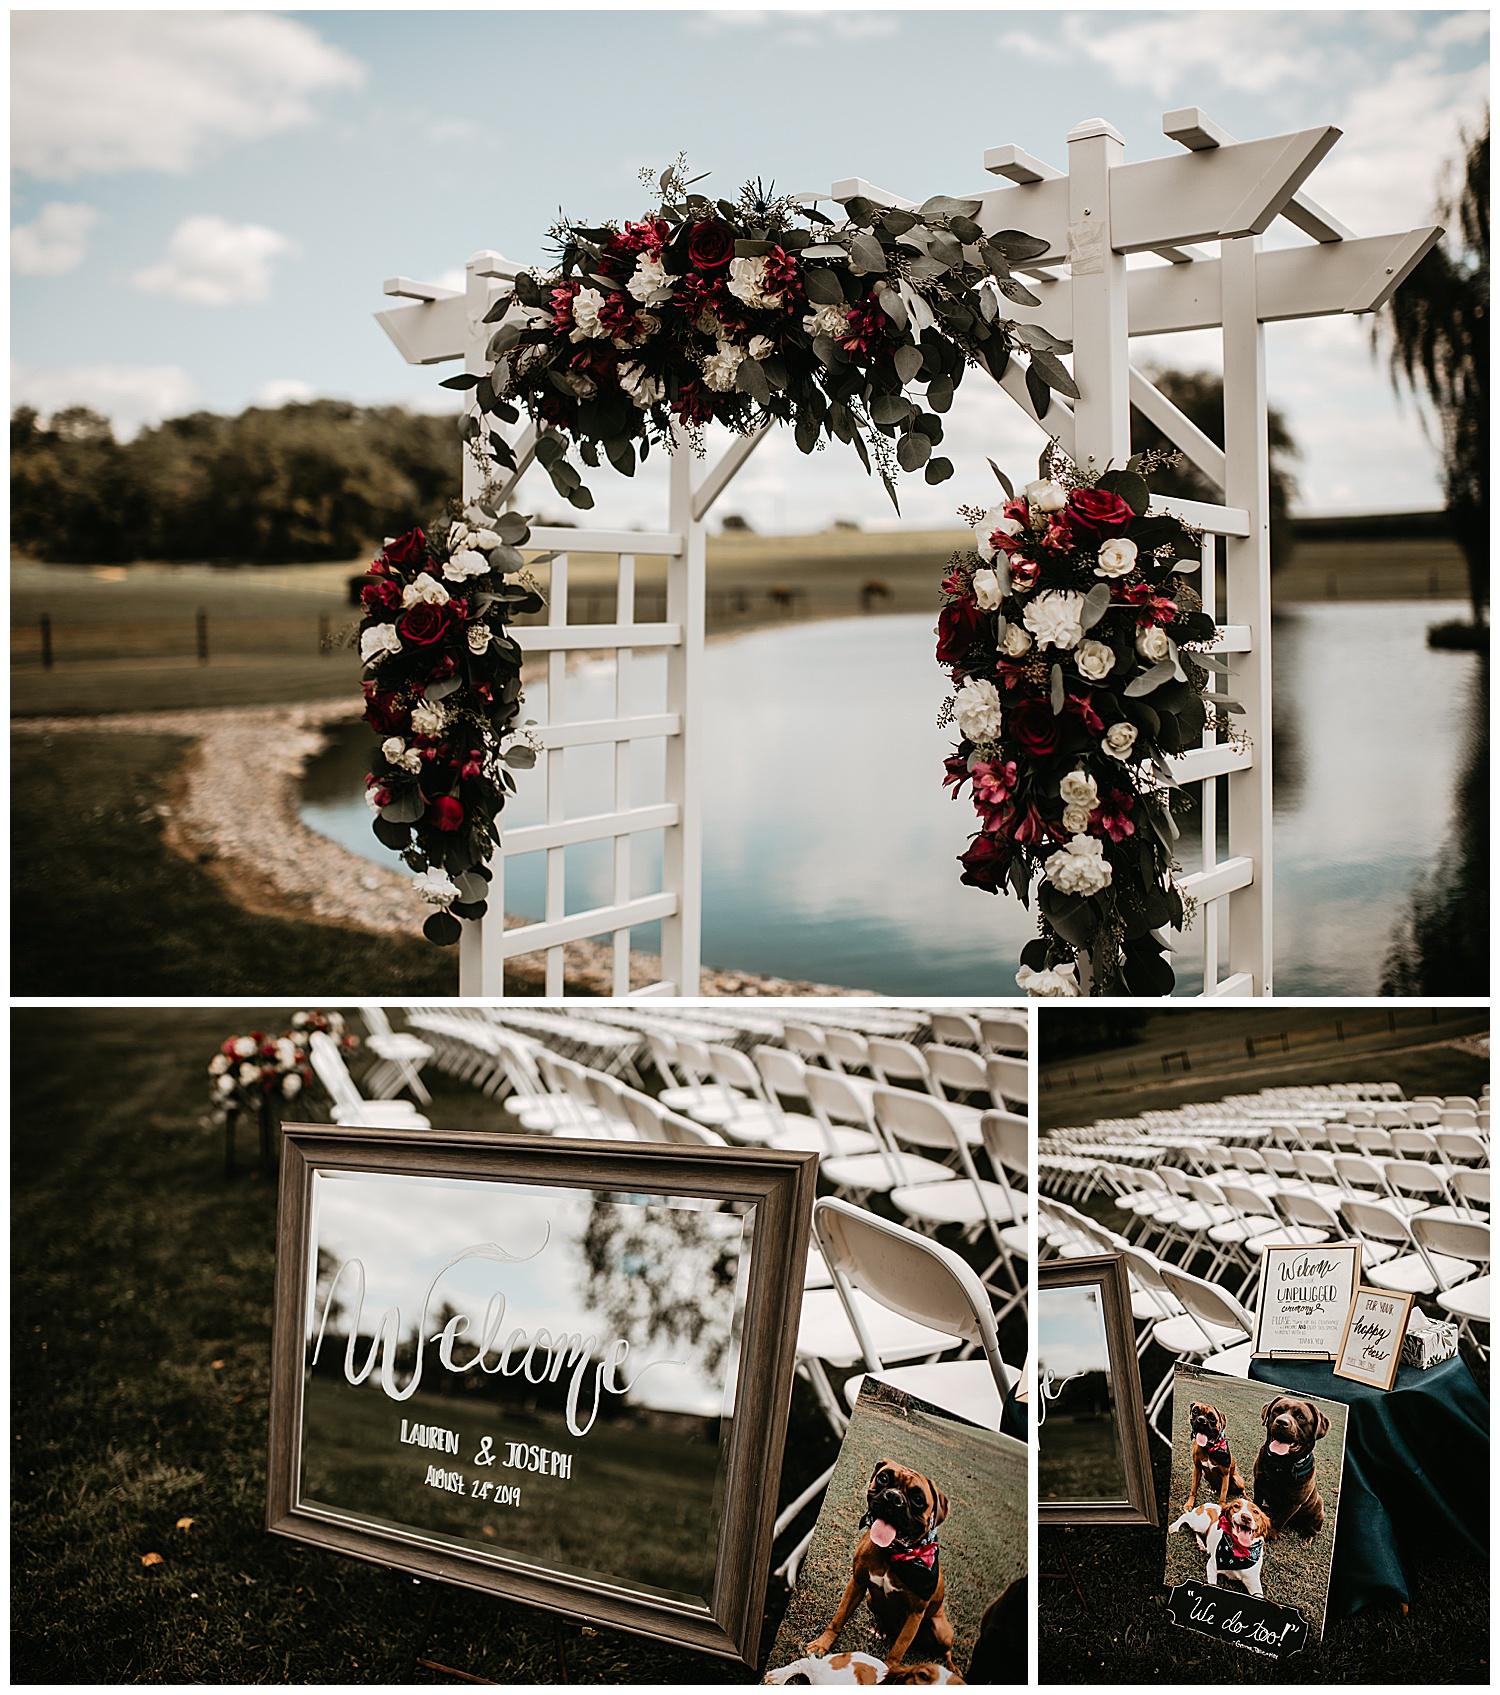 NEPA-Bloomgsburg-Wedding-Photographer-at-The-Barn-at-Greystone-Farms-Watsontown-PA_0055.jpg